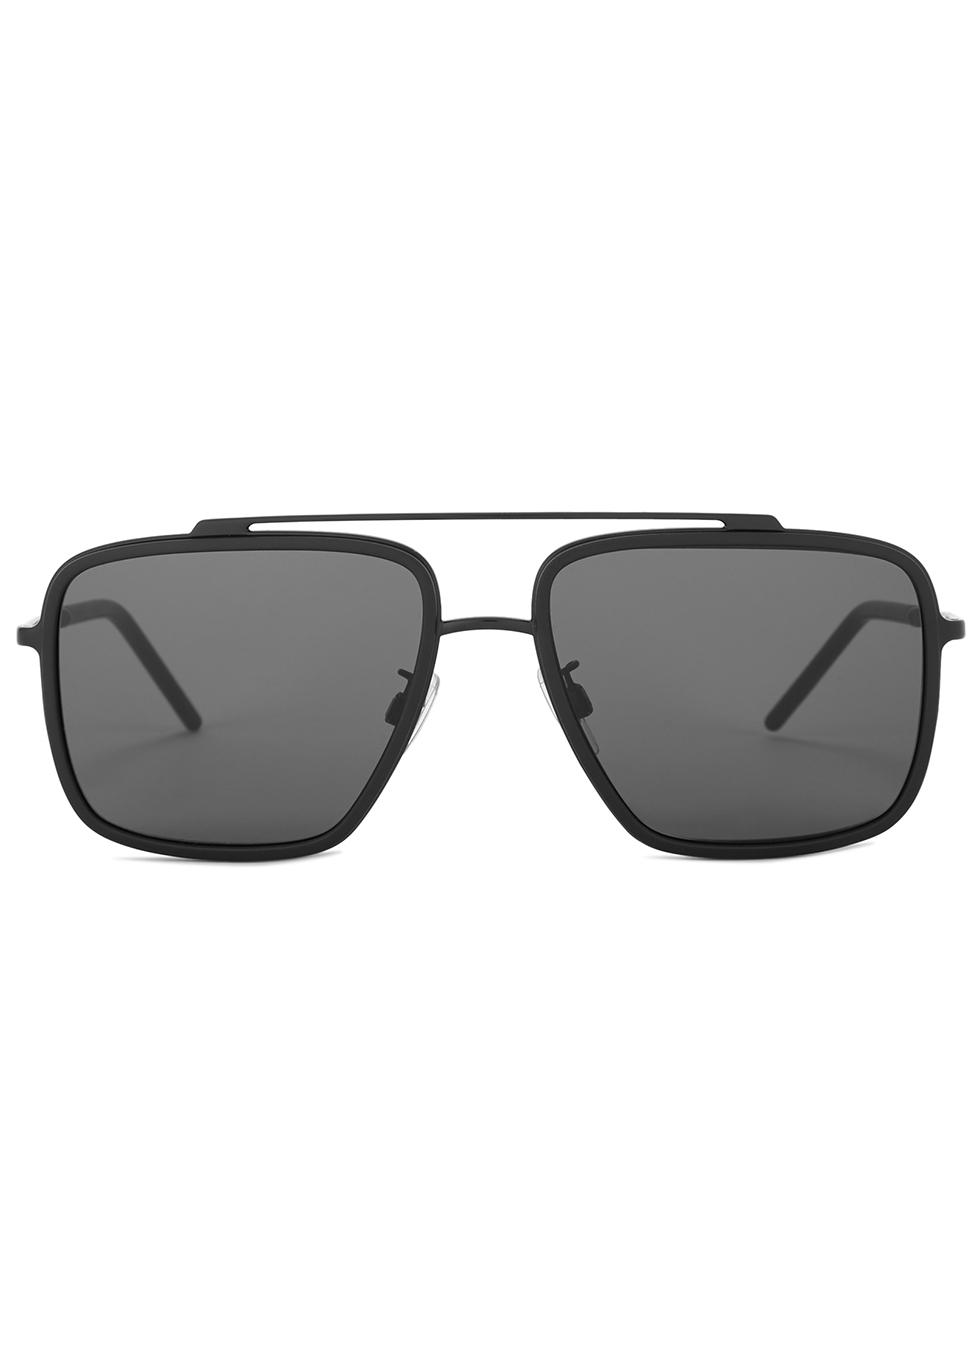 Matte black aviator-style sunglasses - Dolce & Gabbana